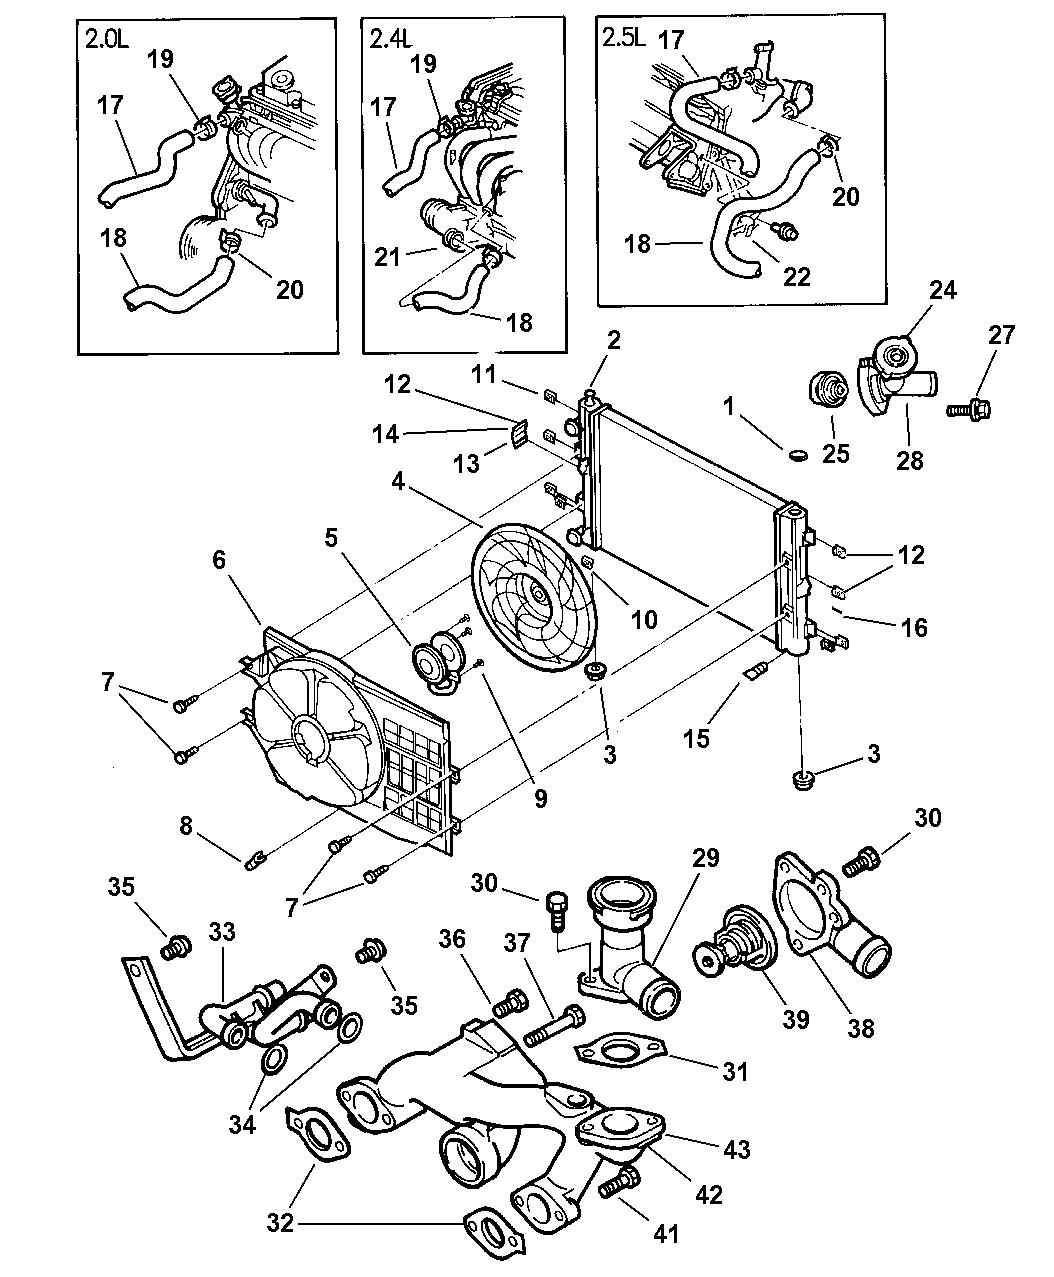 1998 Chrysler Sebring Convertible Radiator & Related Parts